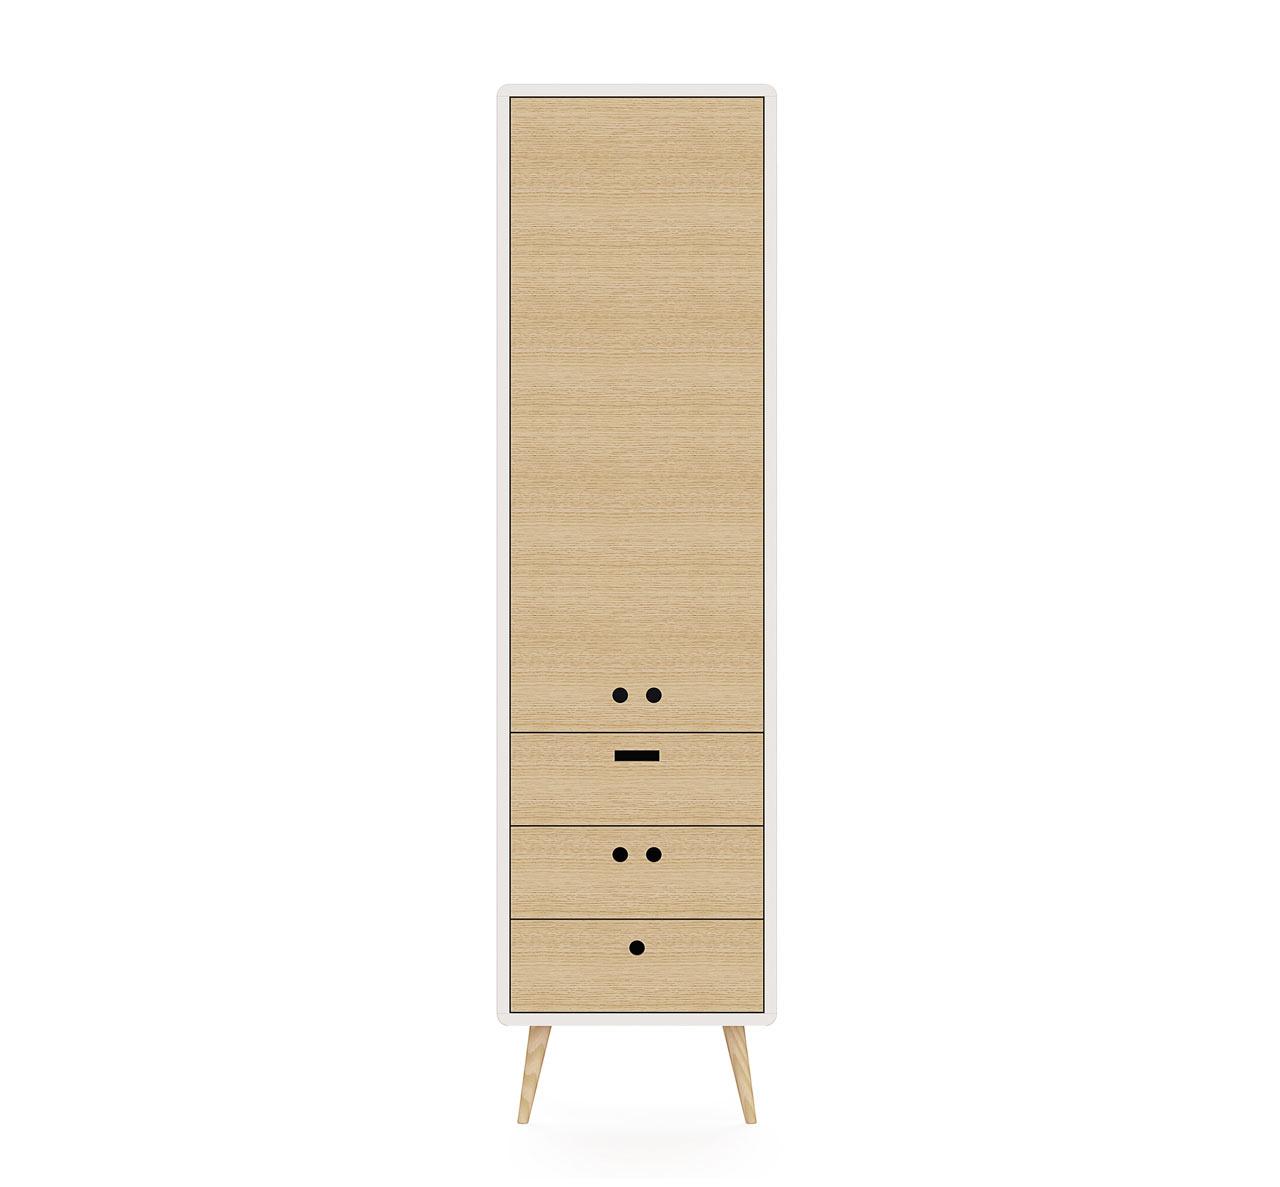 DAM-Furniture-4a-Nandos-Wardrobe